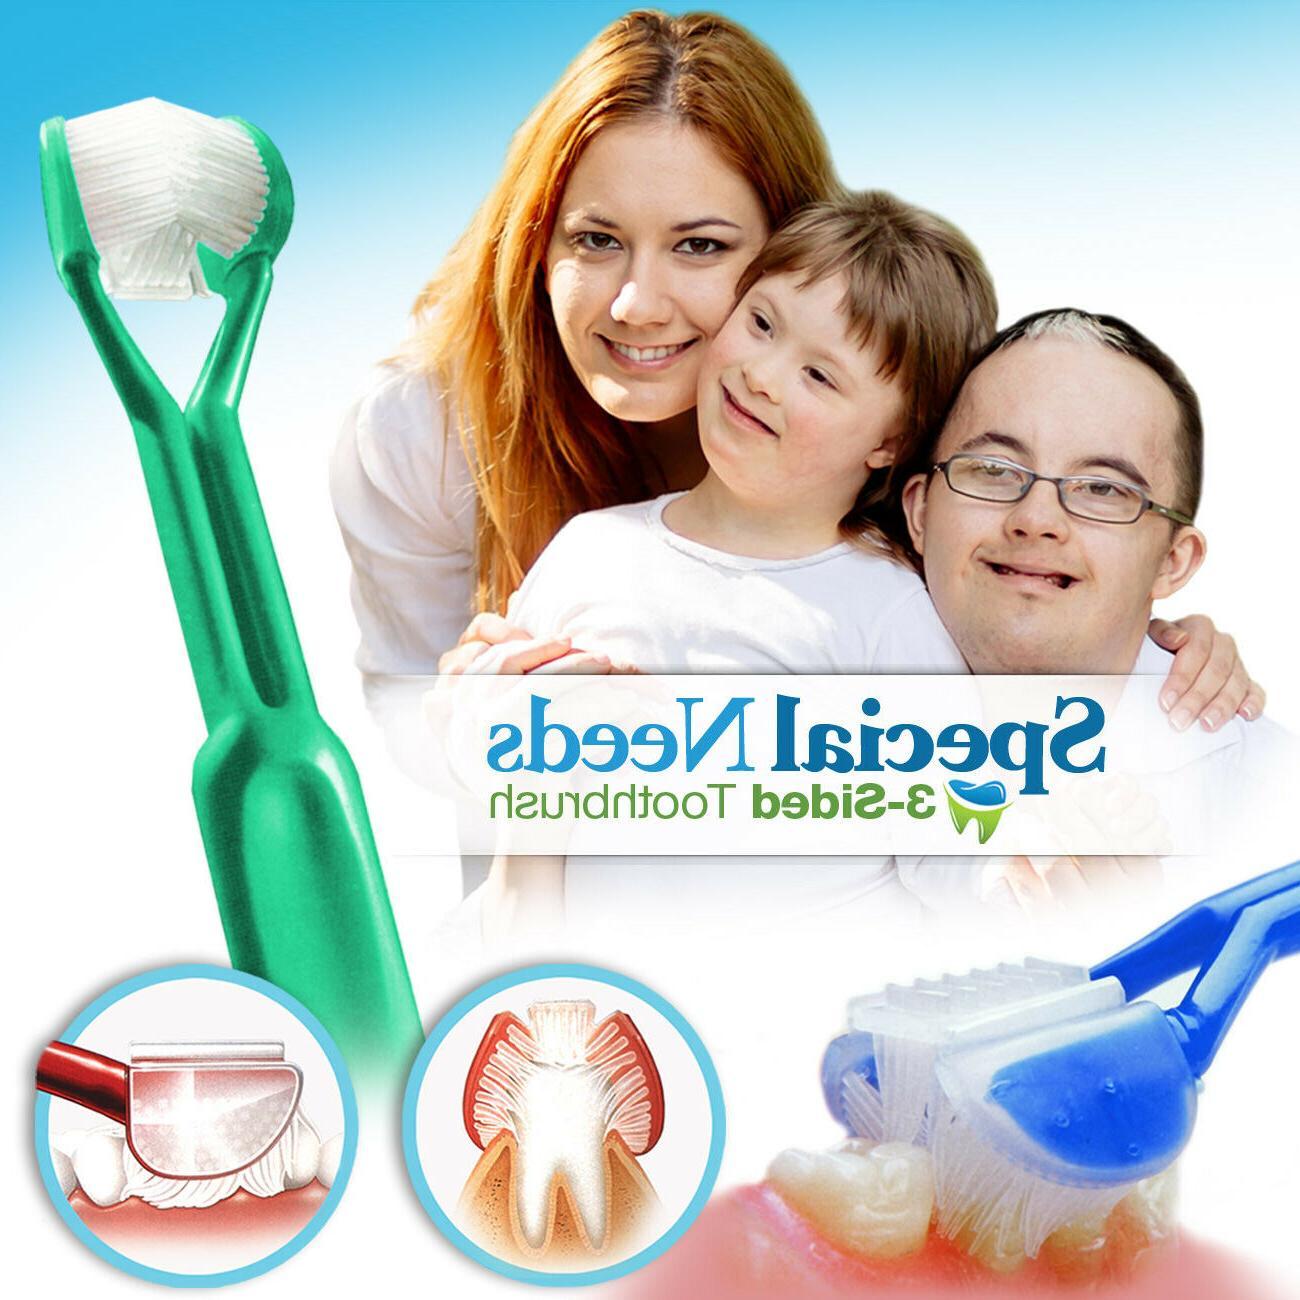 DenTrust 3-Sided Toothbrush :: Caregiver / Assisted Brushing